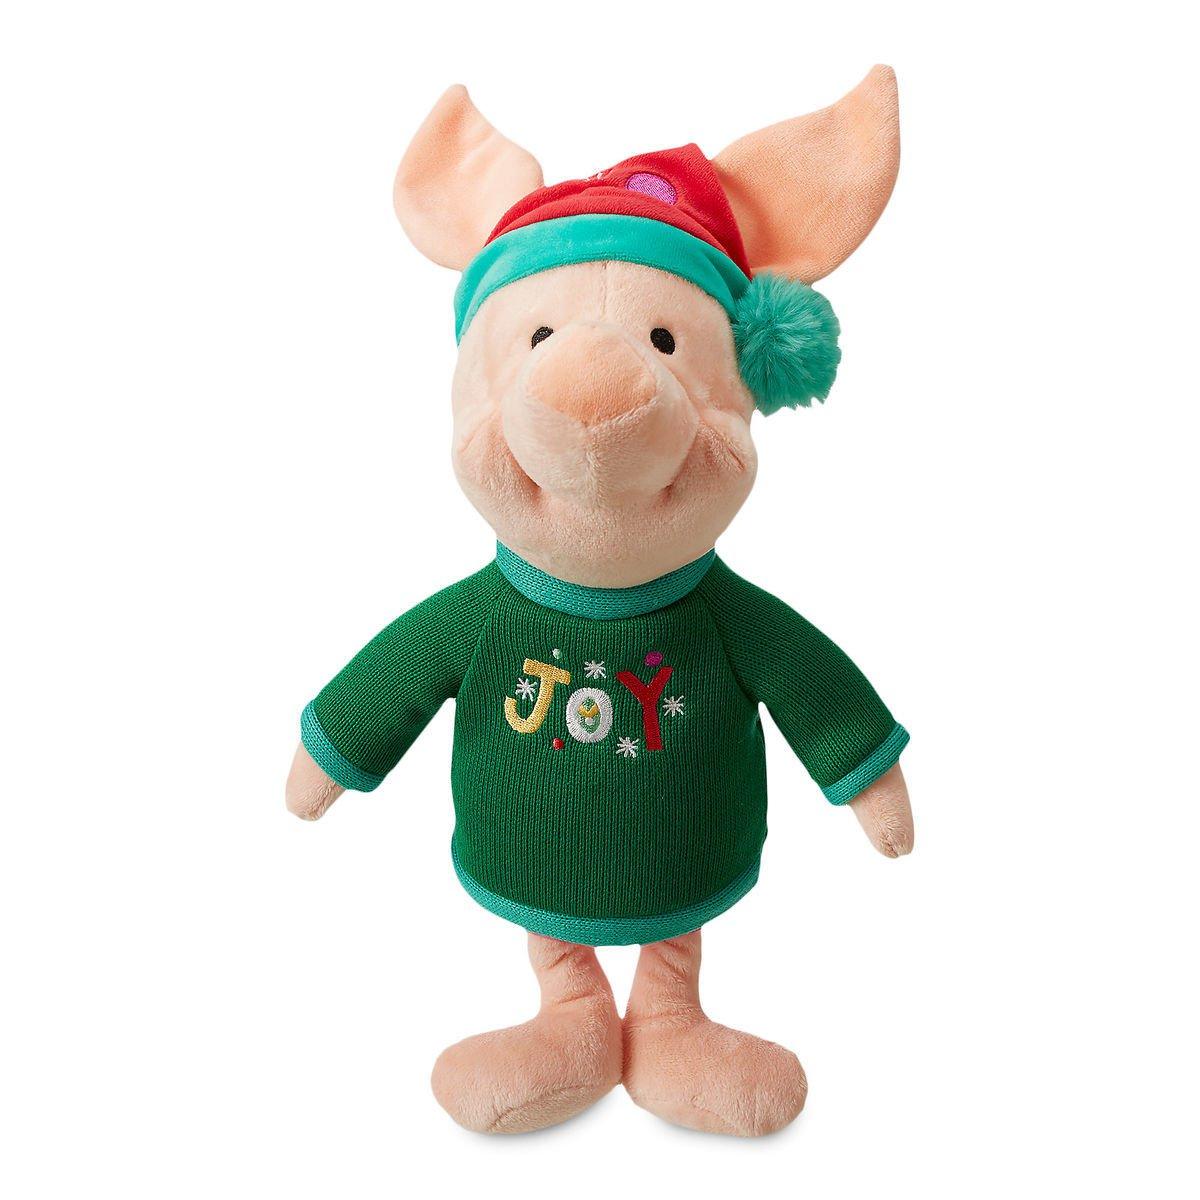 Disney Store Piglet Holiday Plush  Medium 2018